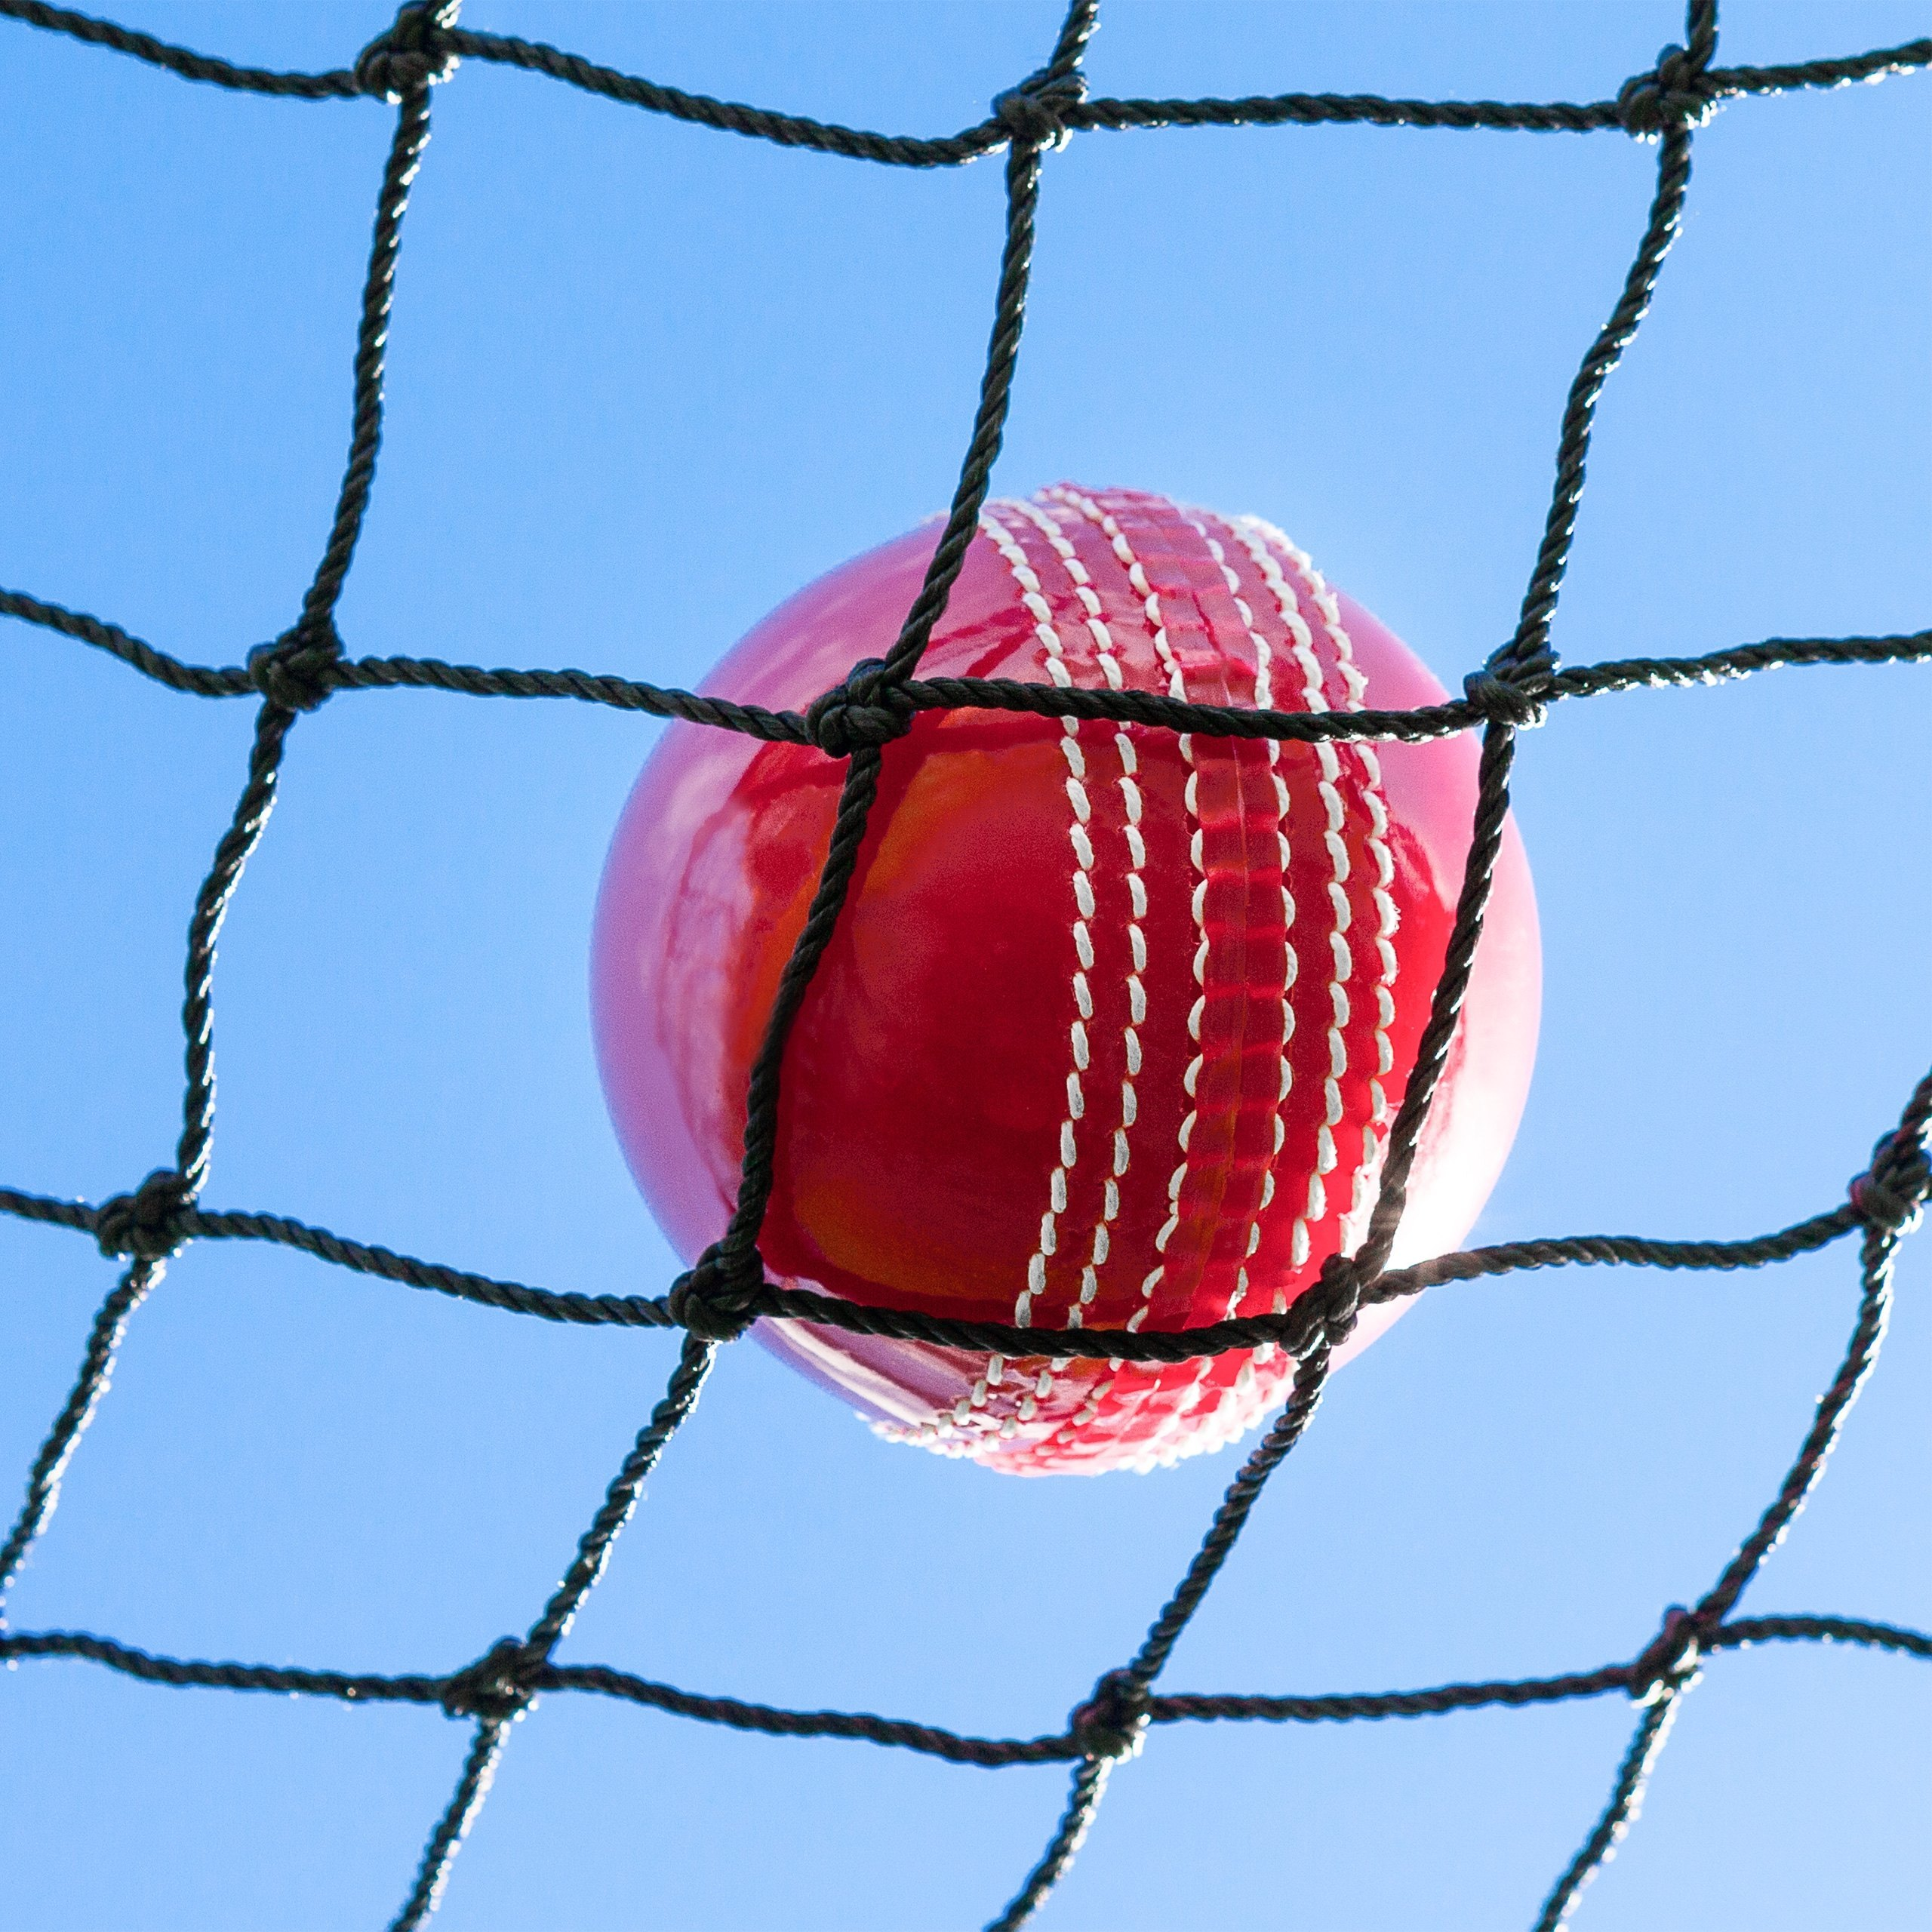 Cricket backstop netting